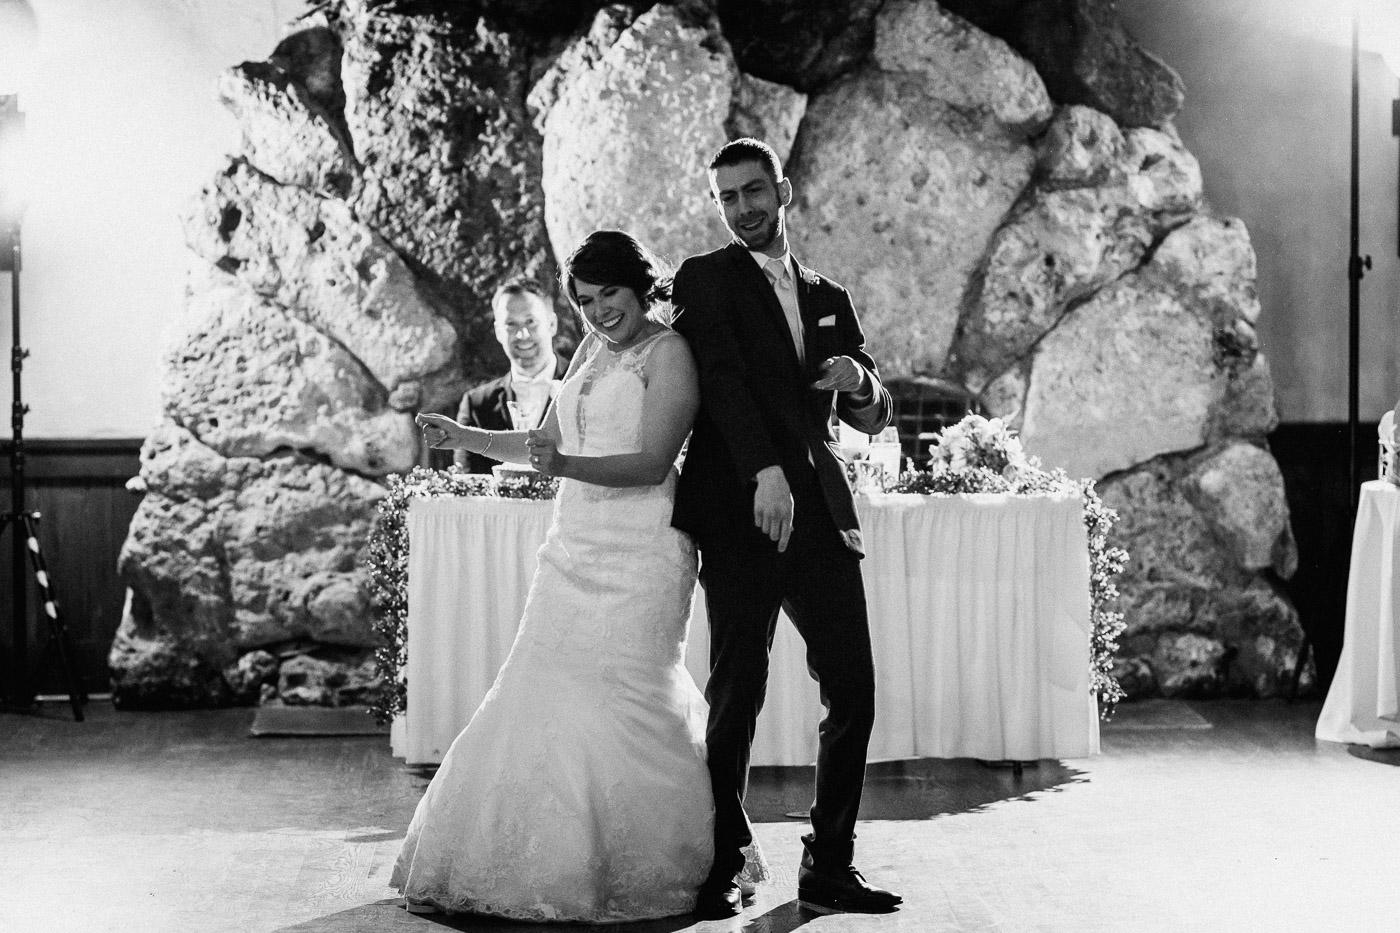 hstoric-dubsdread-wedding-orlando-57.jpg